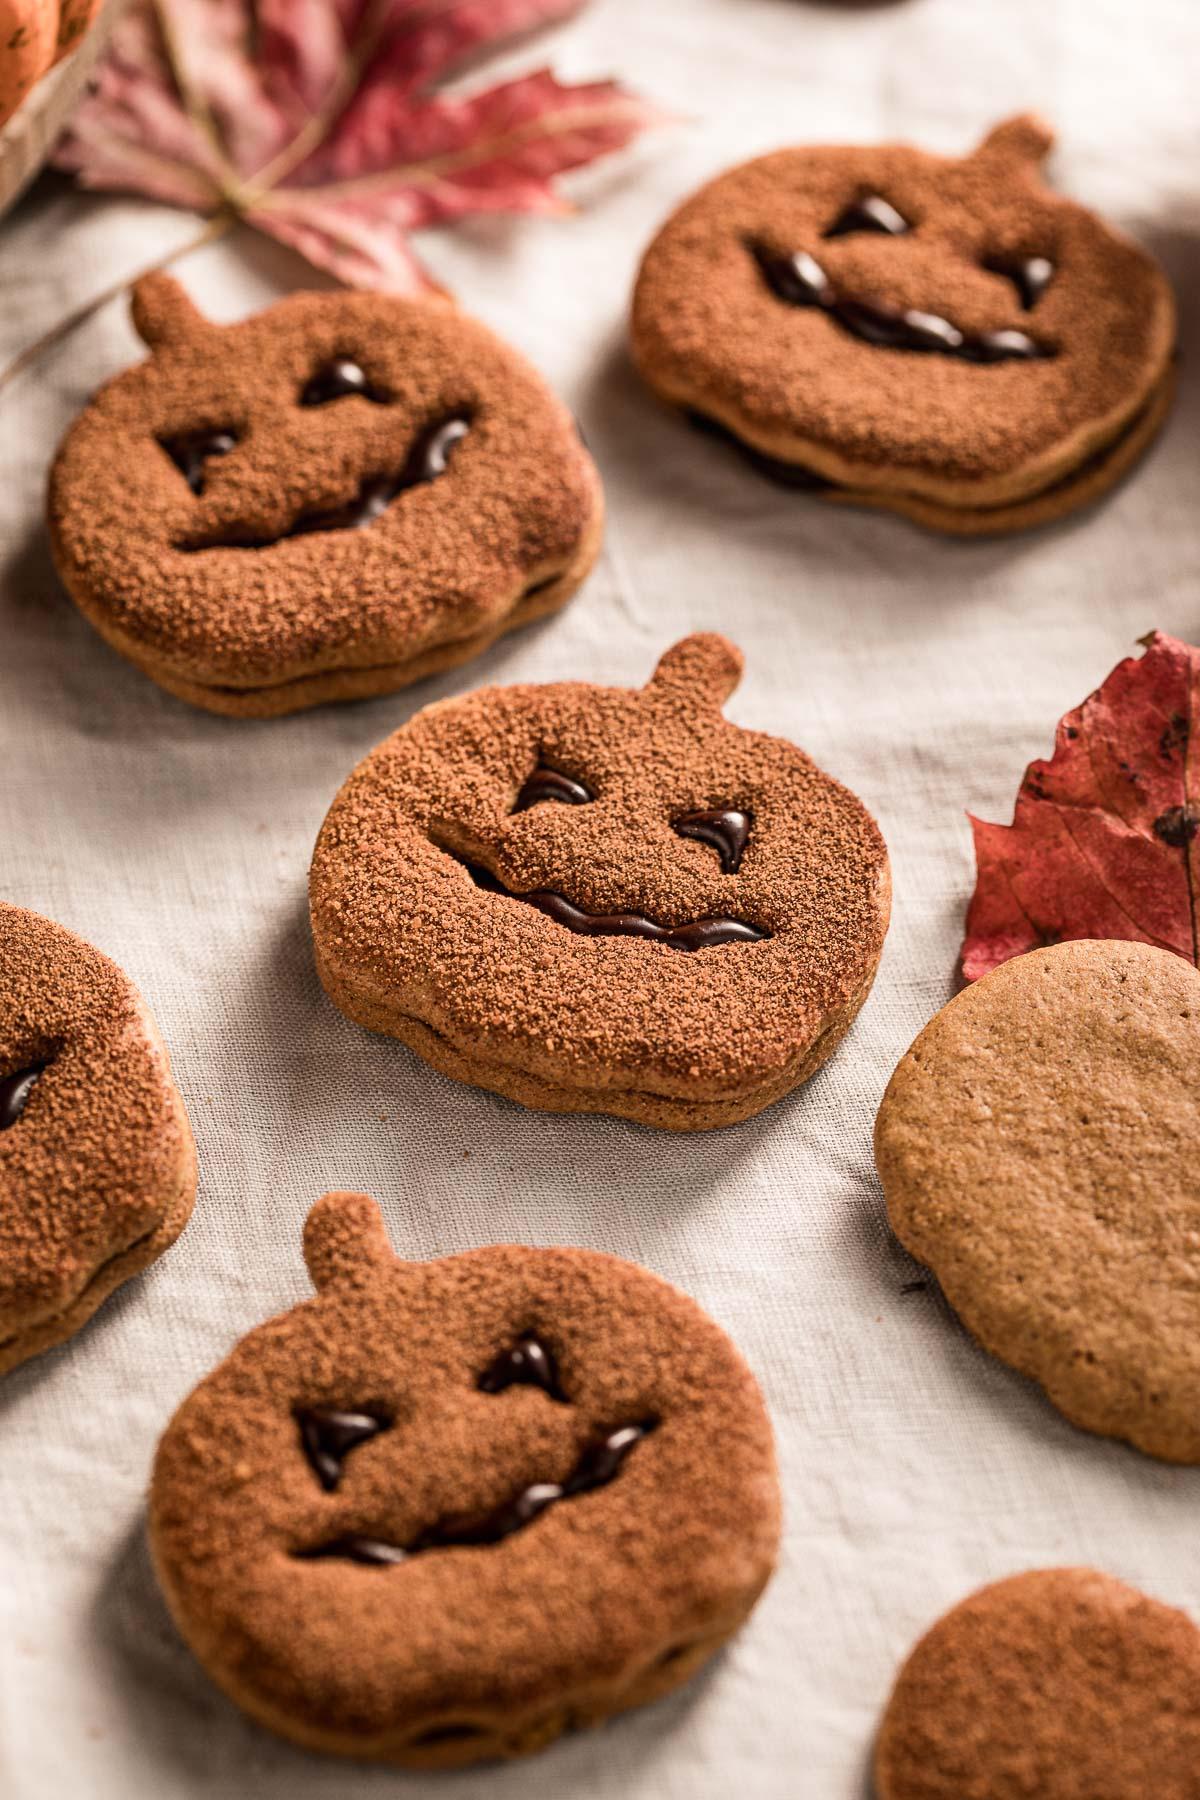 biscotti vegan alla zucca frollini integrali senza uova senza burro vegan pumpkin cutout cookies recipe cinnamon sugar Halloween cookies Jack O Lantern